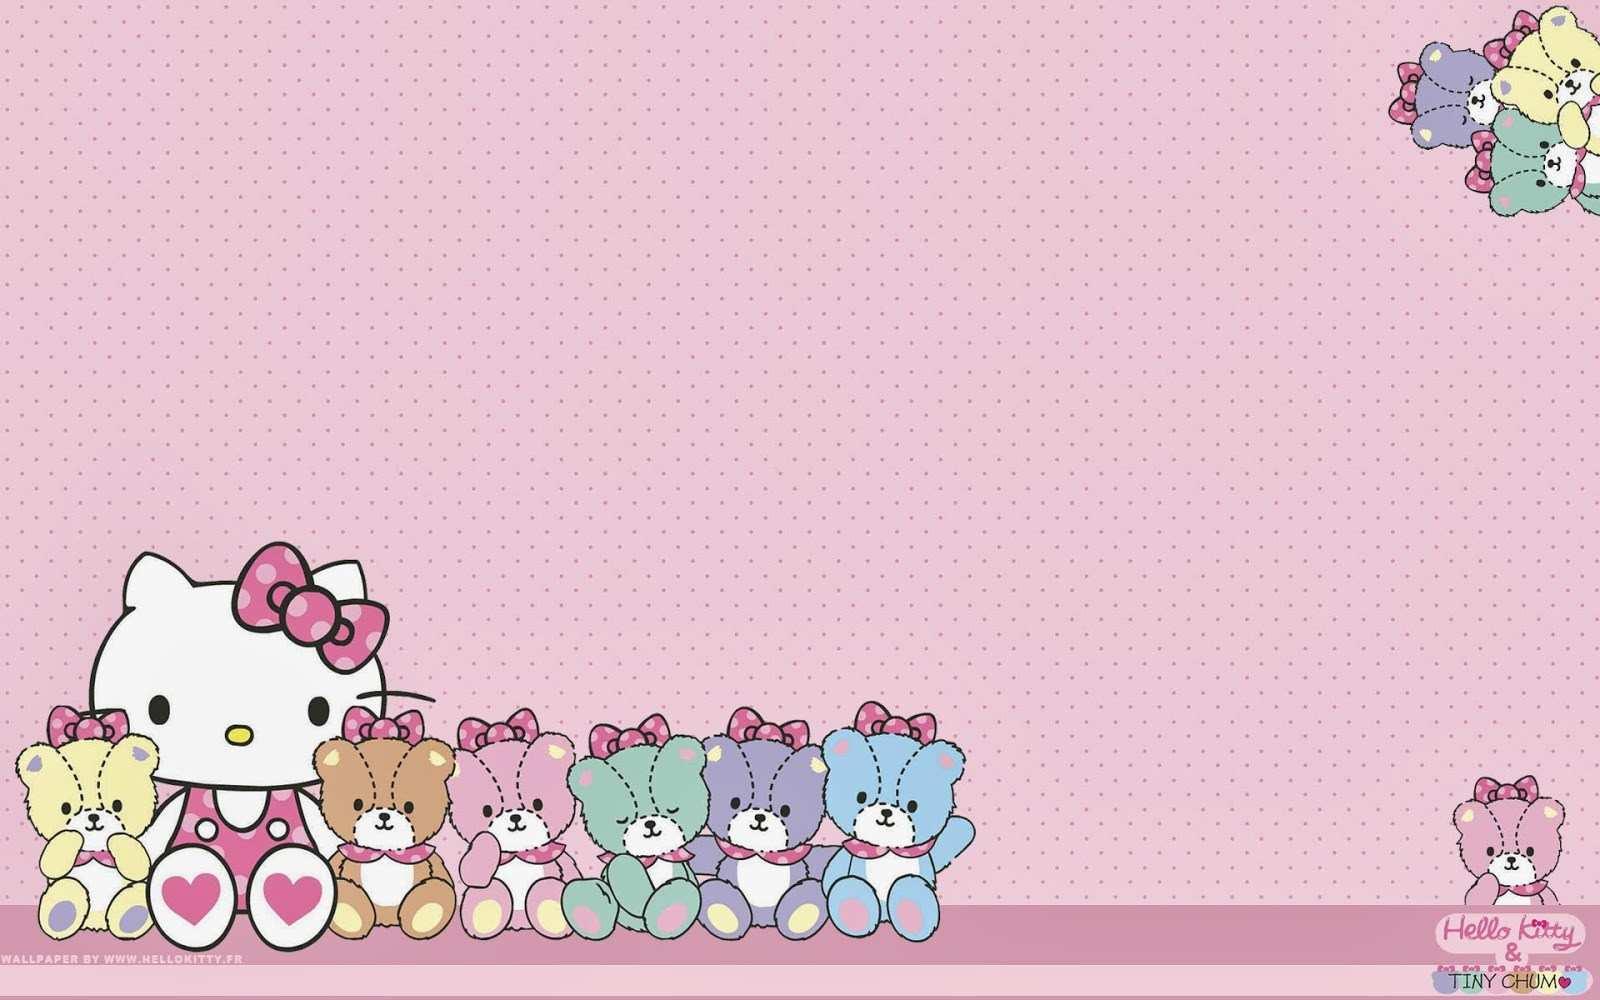 Kumpulan Gambar Lucu Bergerak Hello Kitty Page Hello Kitty